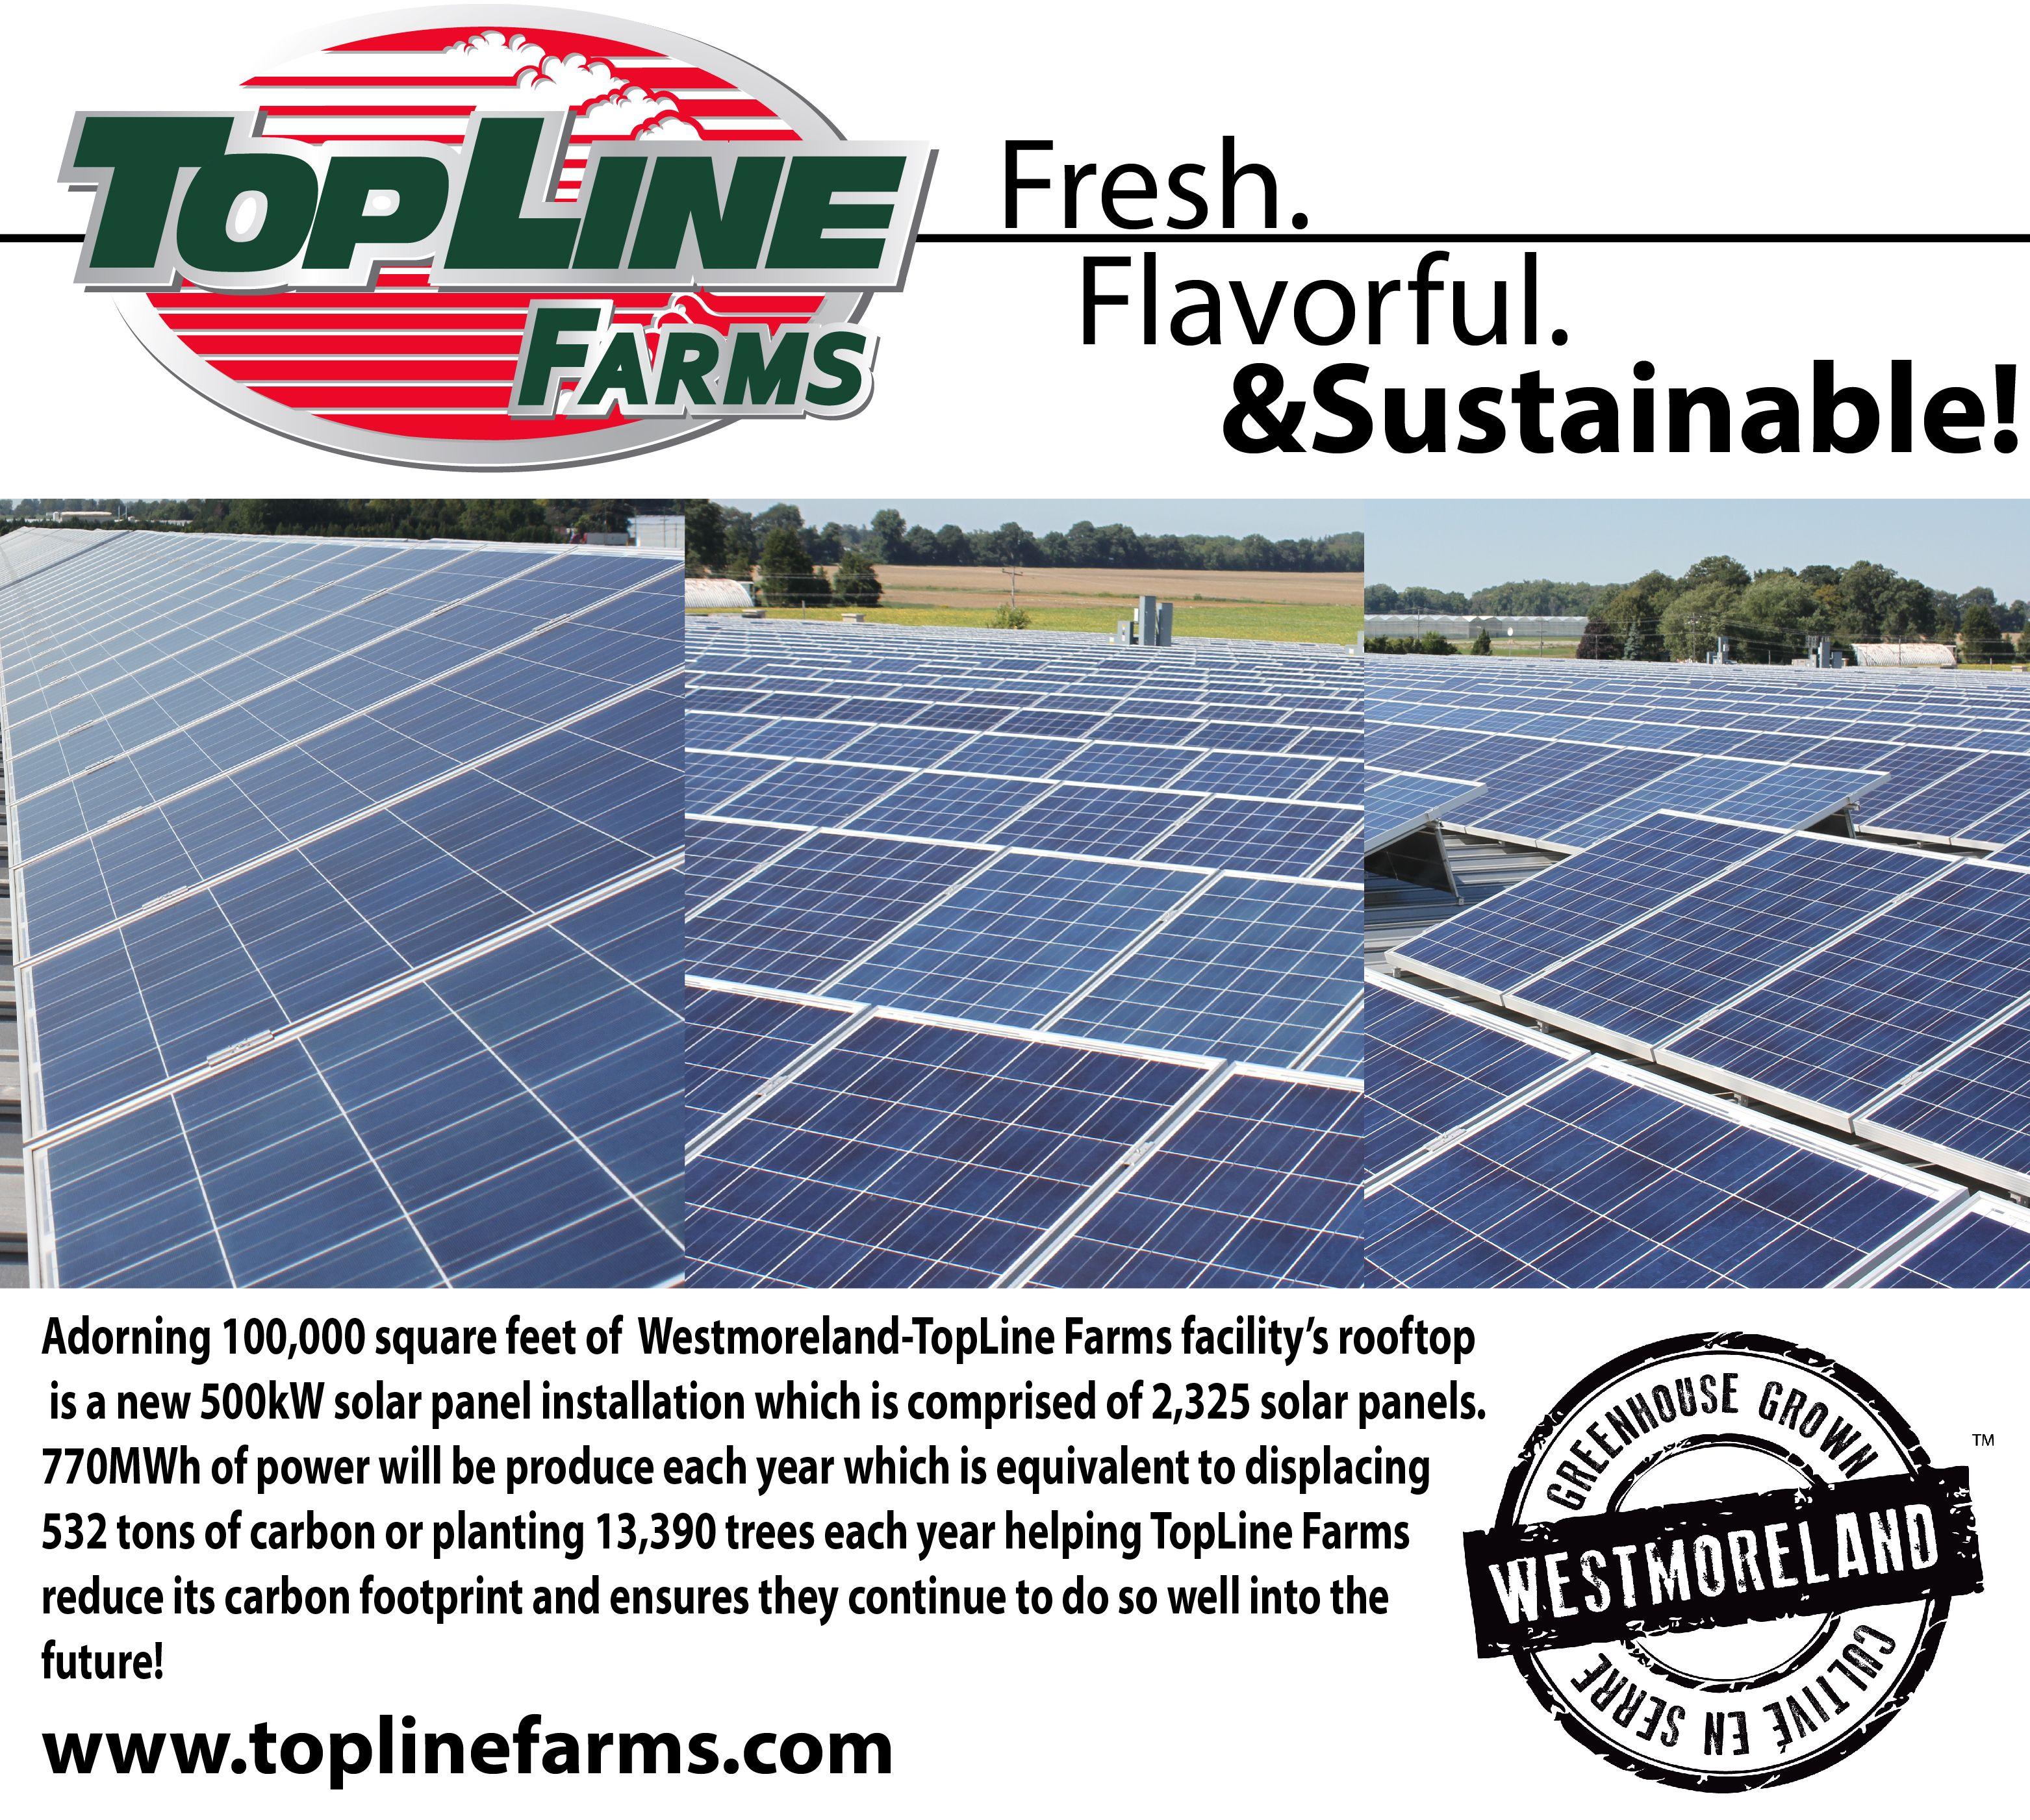 Toplinefarms Fresh Flavorful Sustainable Toplinefarms Reducing Their Carbonfootprint Well Into The Future Roof Solar Panel Solar Solar Panels